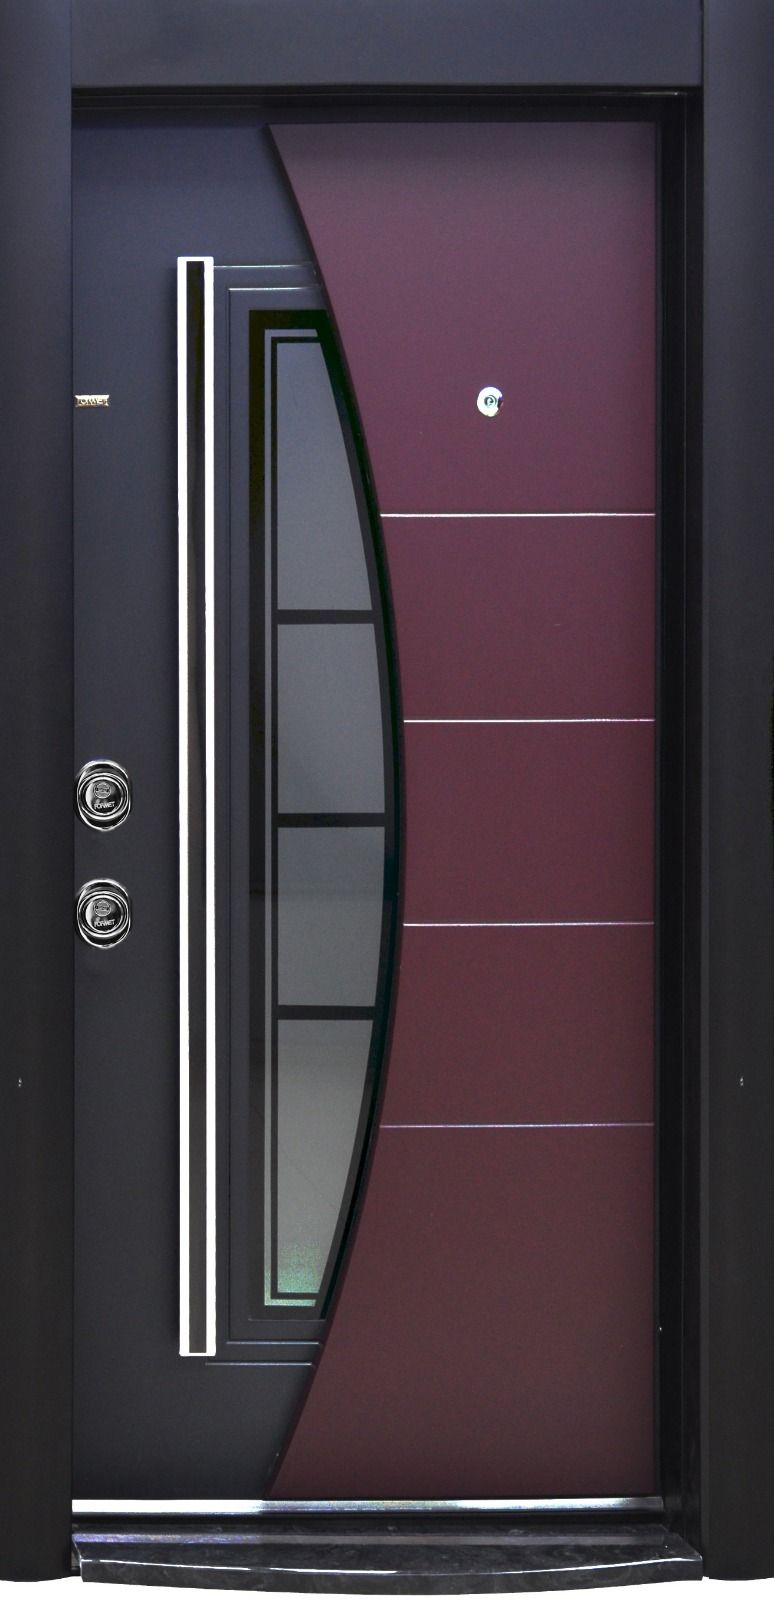 Pin By Mujeeb J On Home Ideas Door Design Interior Bedroom Door Design Home Door Design